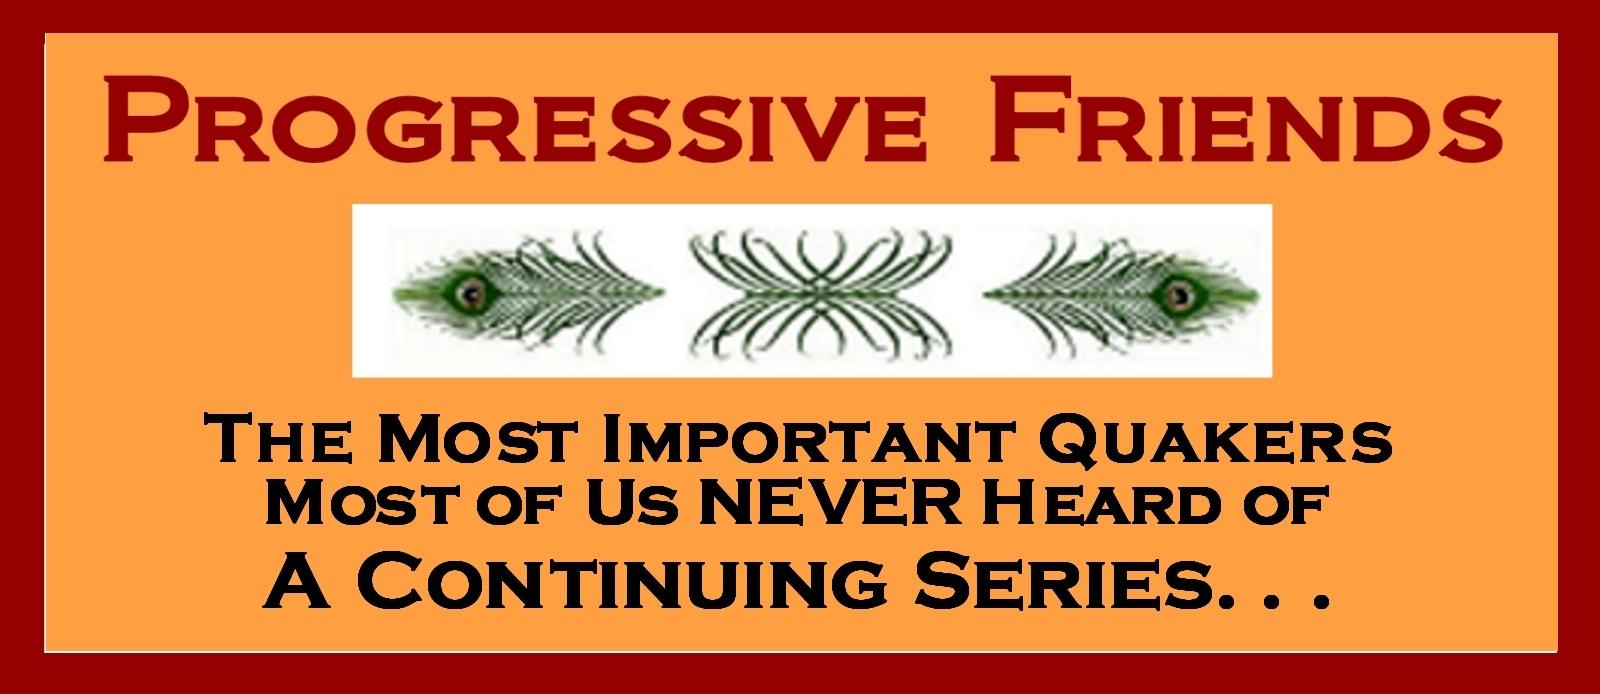 Progressive Friends: A Continuing Series